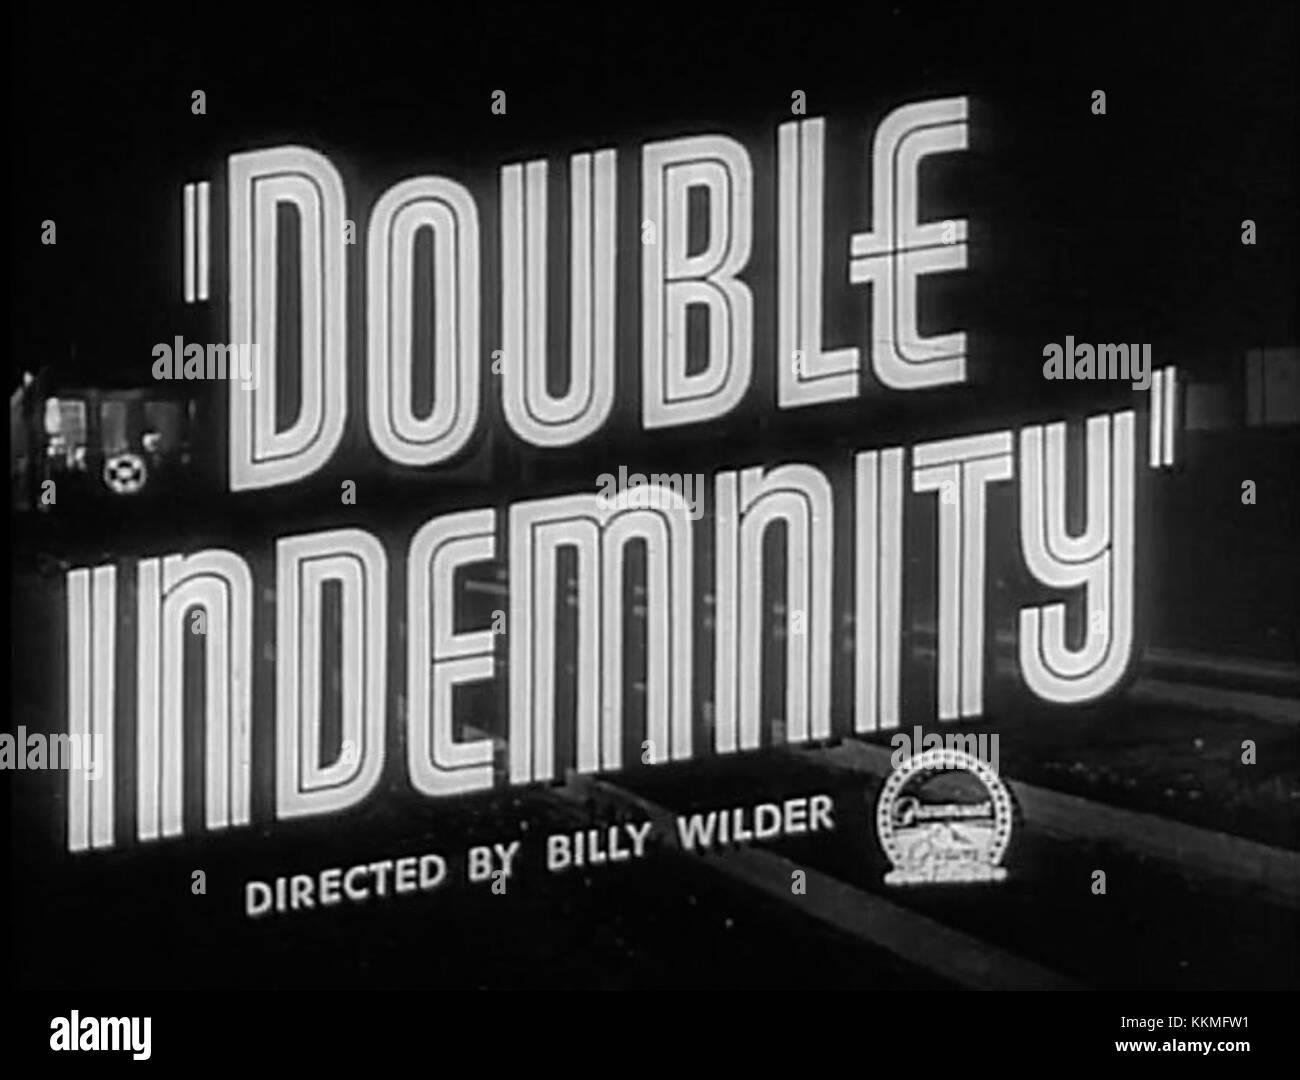 Double indemnity screenshot 10 - Stock Image